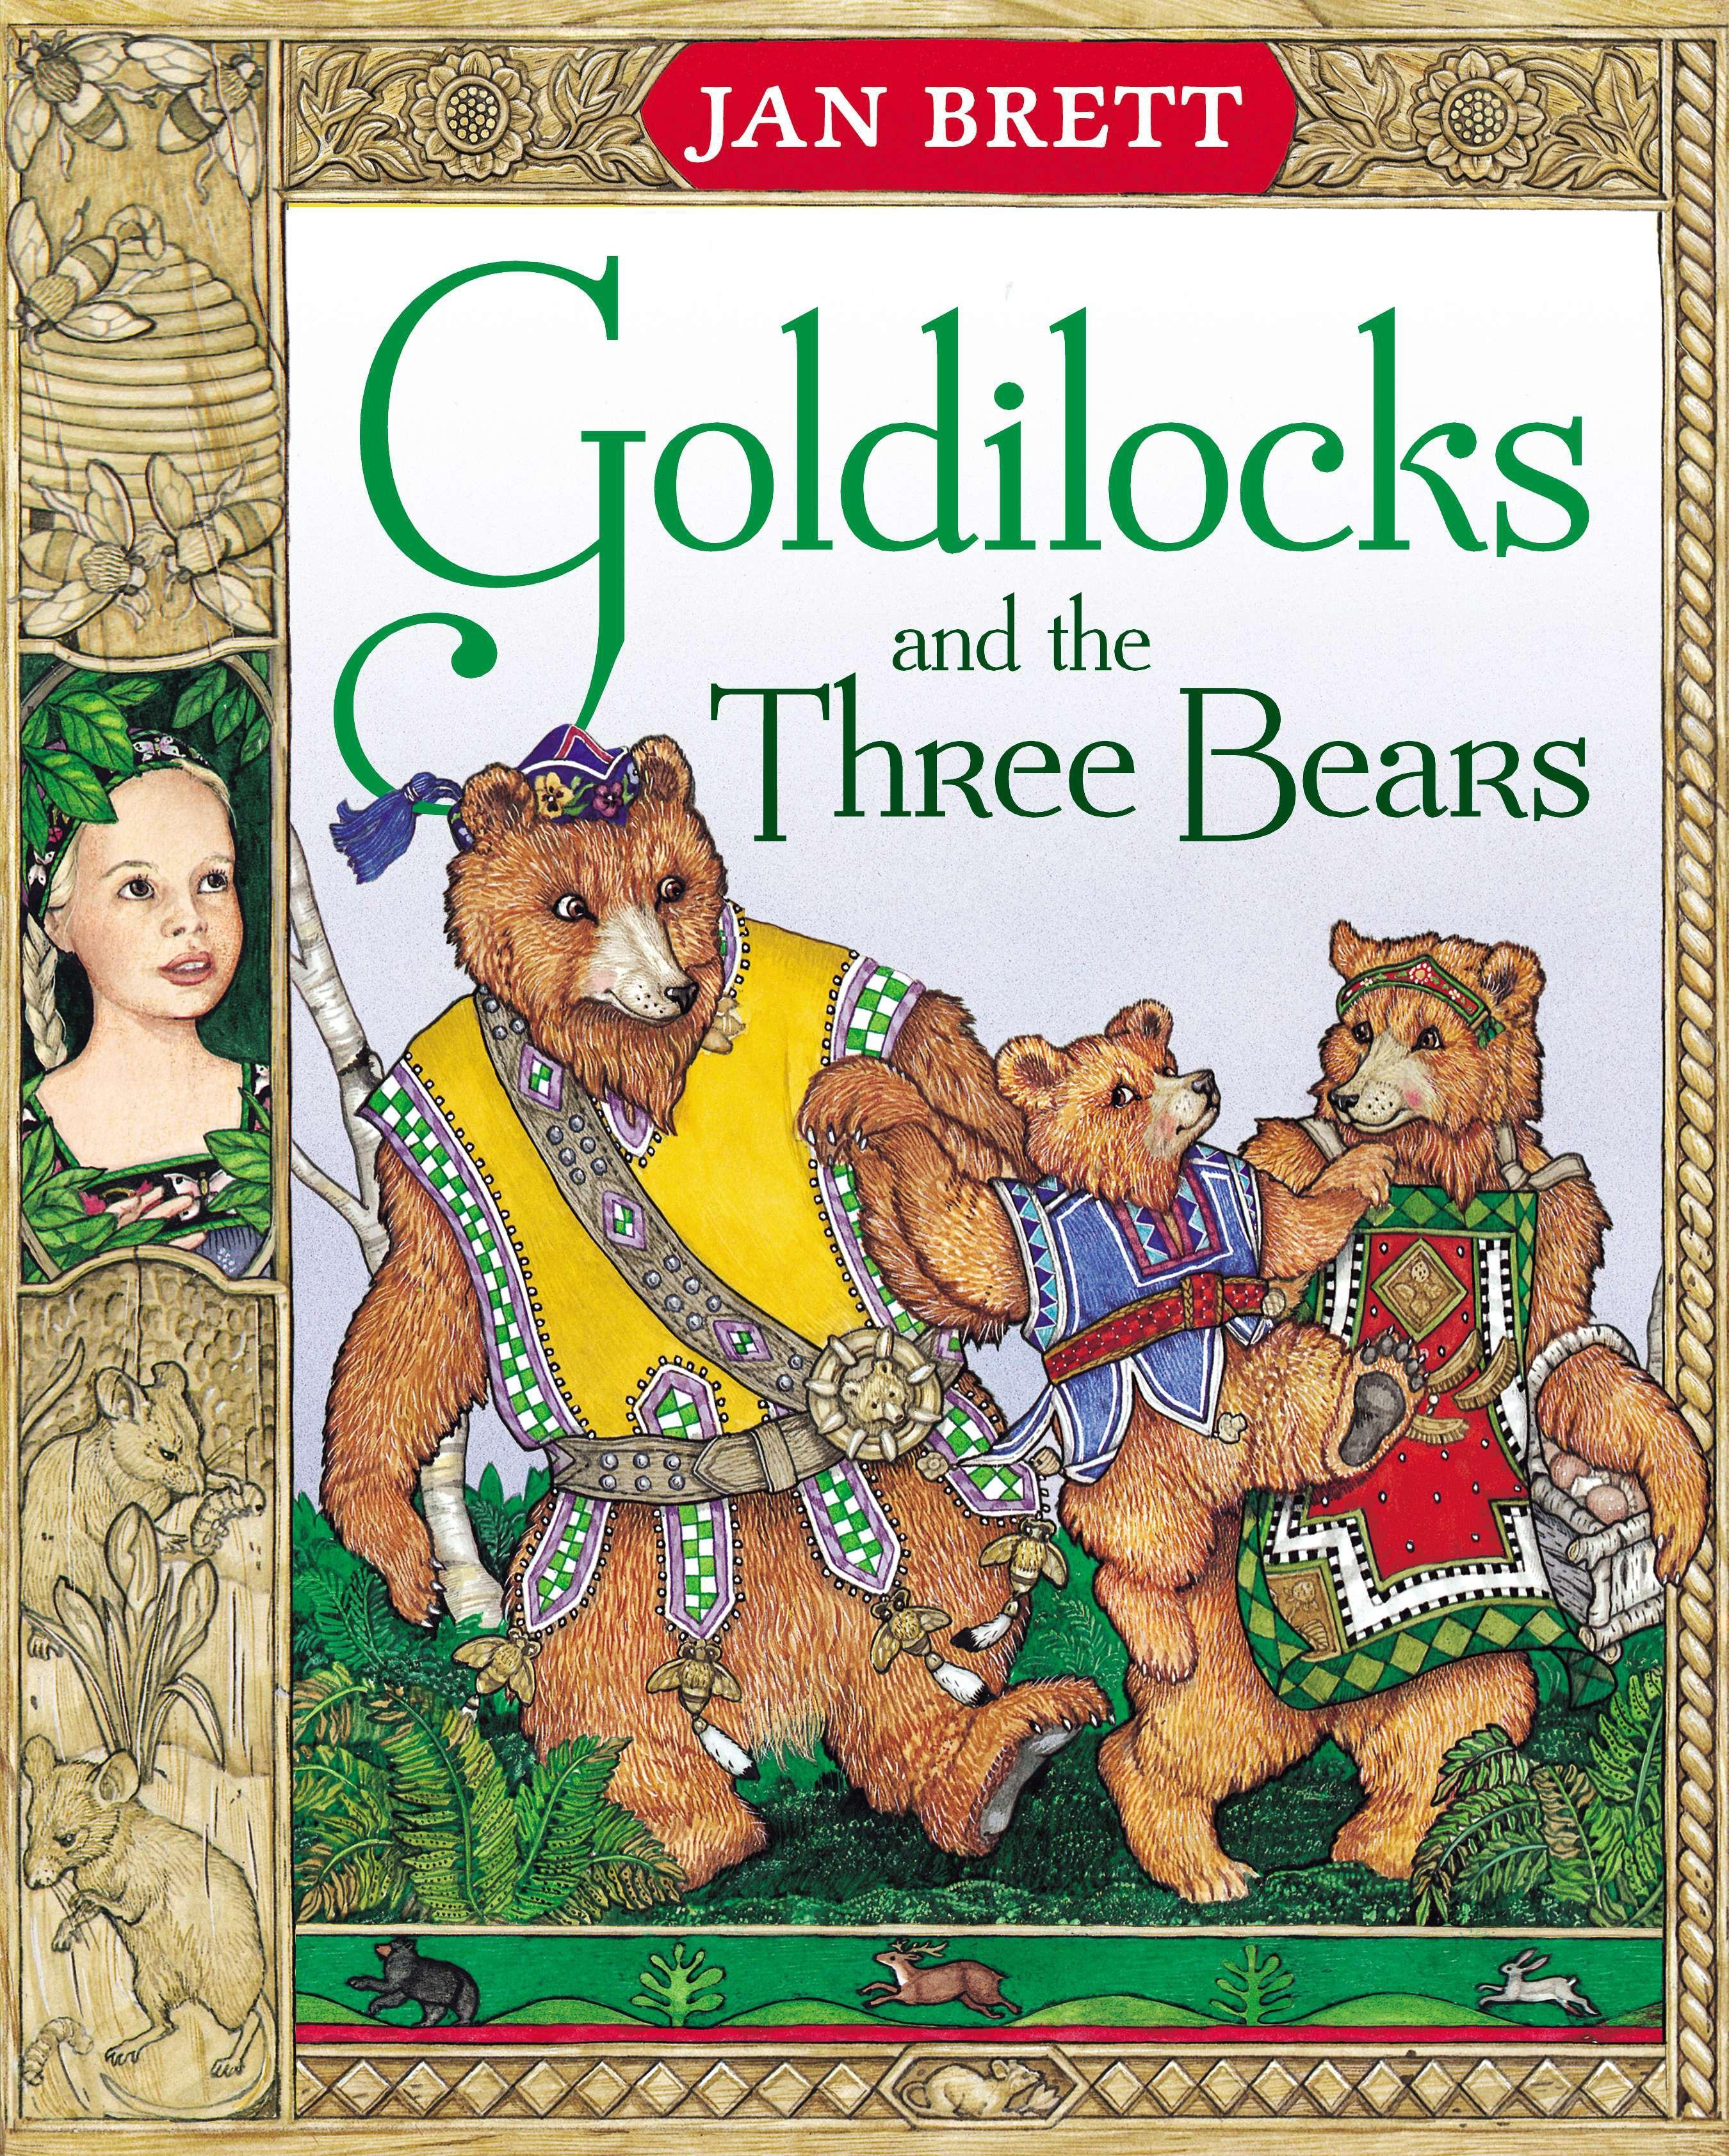 Goldilocks and the Three Bears  Jan Brett  Taschenbuch  Englisch  1996 - Brett, Jan